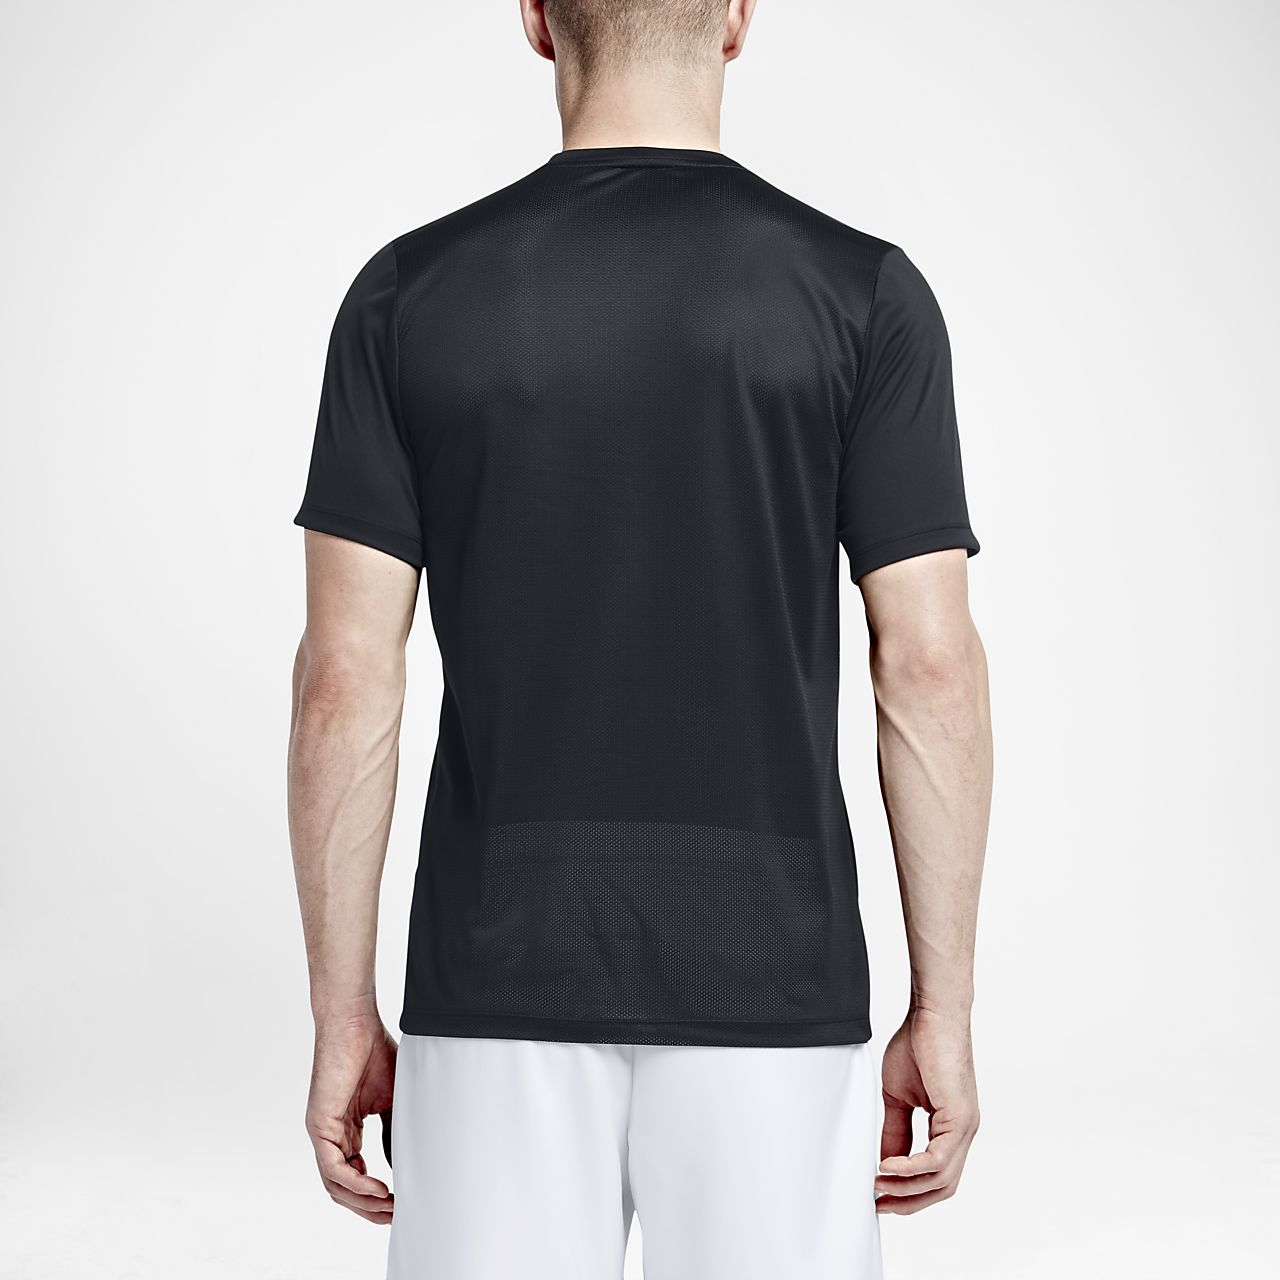 Nike Men's Dry Academy Football Top (Black)